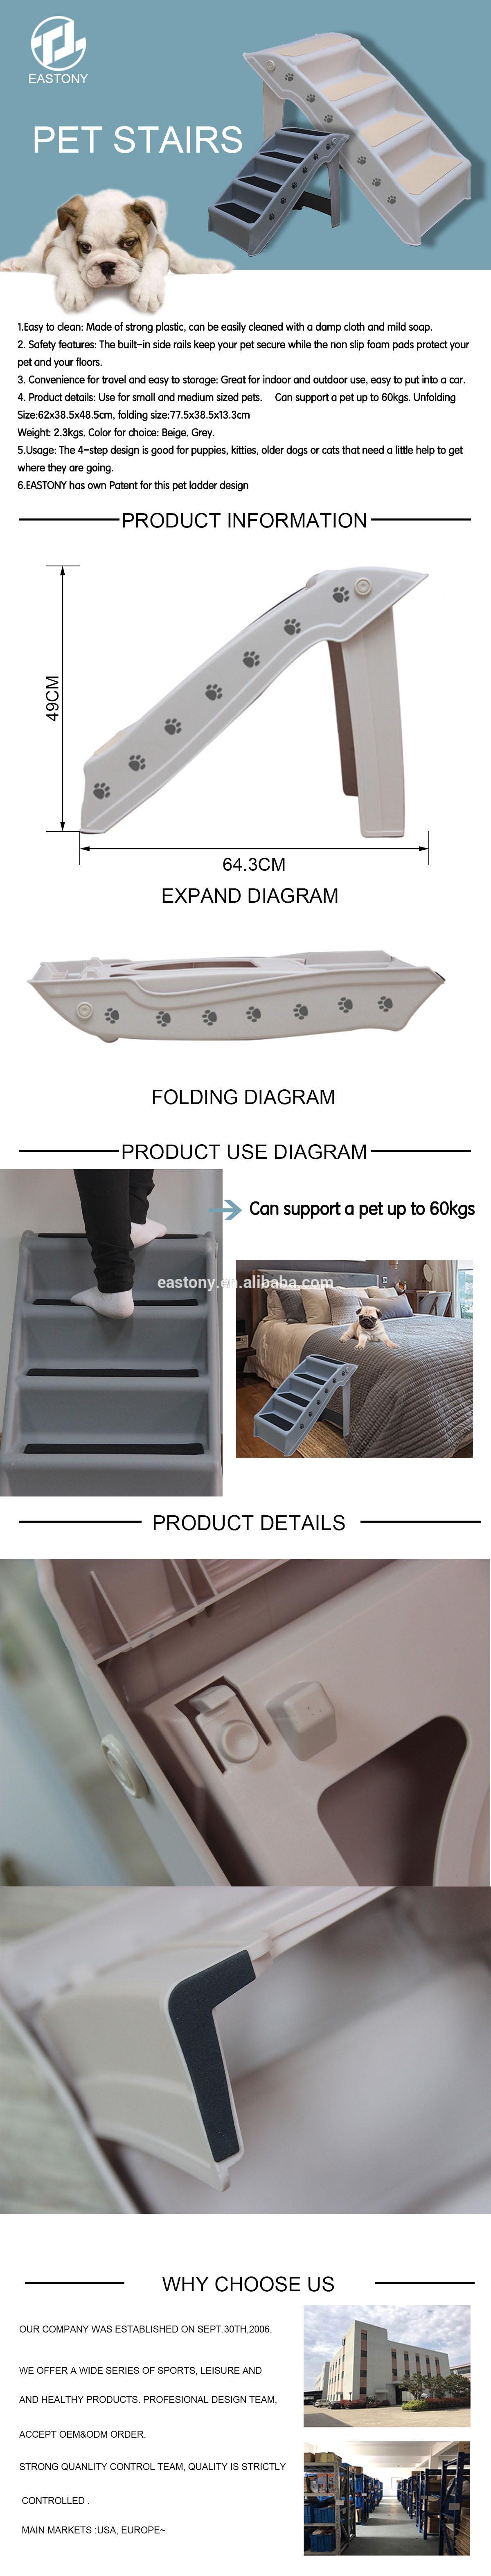 pet steps for dog or cat